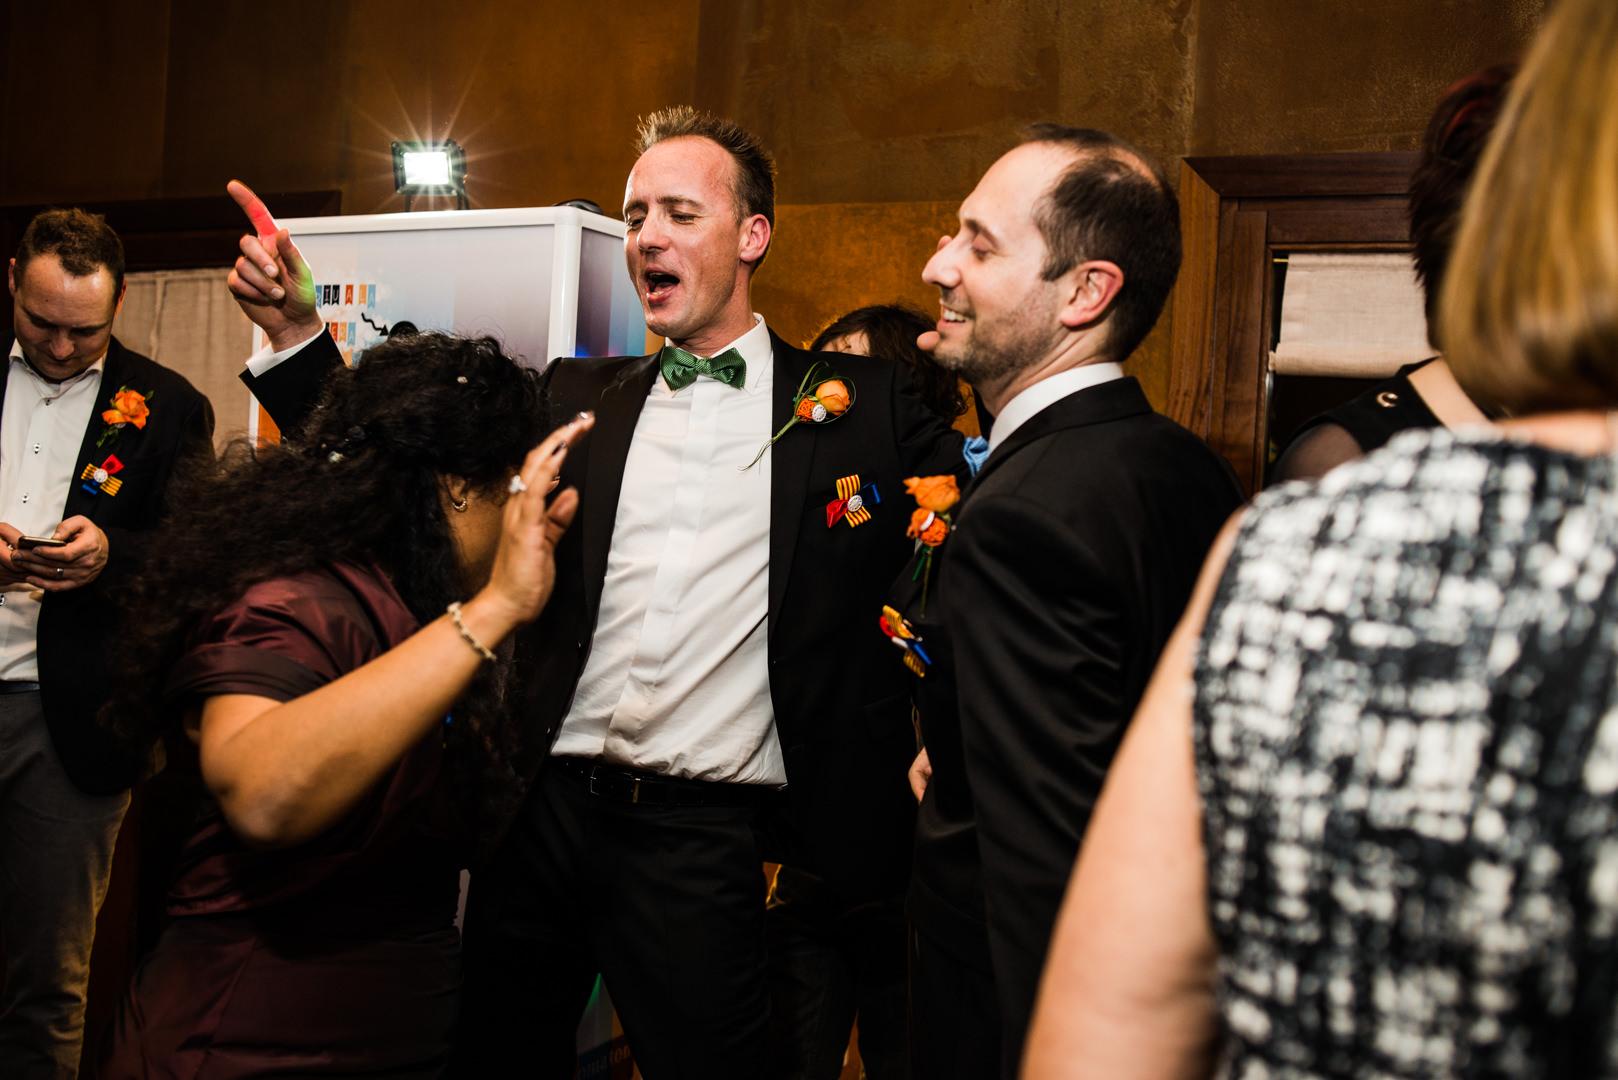 Same-sex-wedding-barcelona-boda- gay-samesex-engagement-Rafael-Torres-fotografo-bodas-sevilla-madrid-barcelona-wedding-photographer--60.jpg